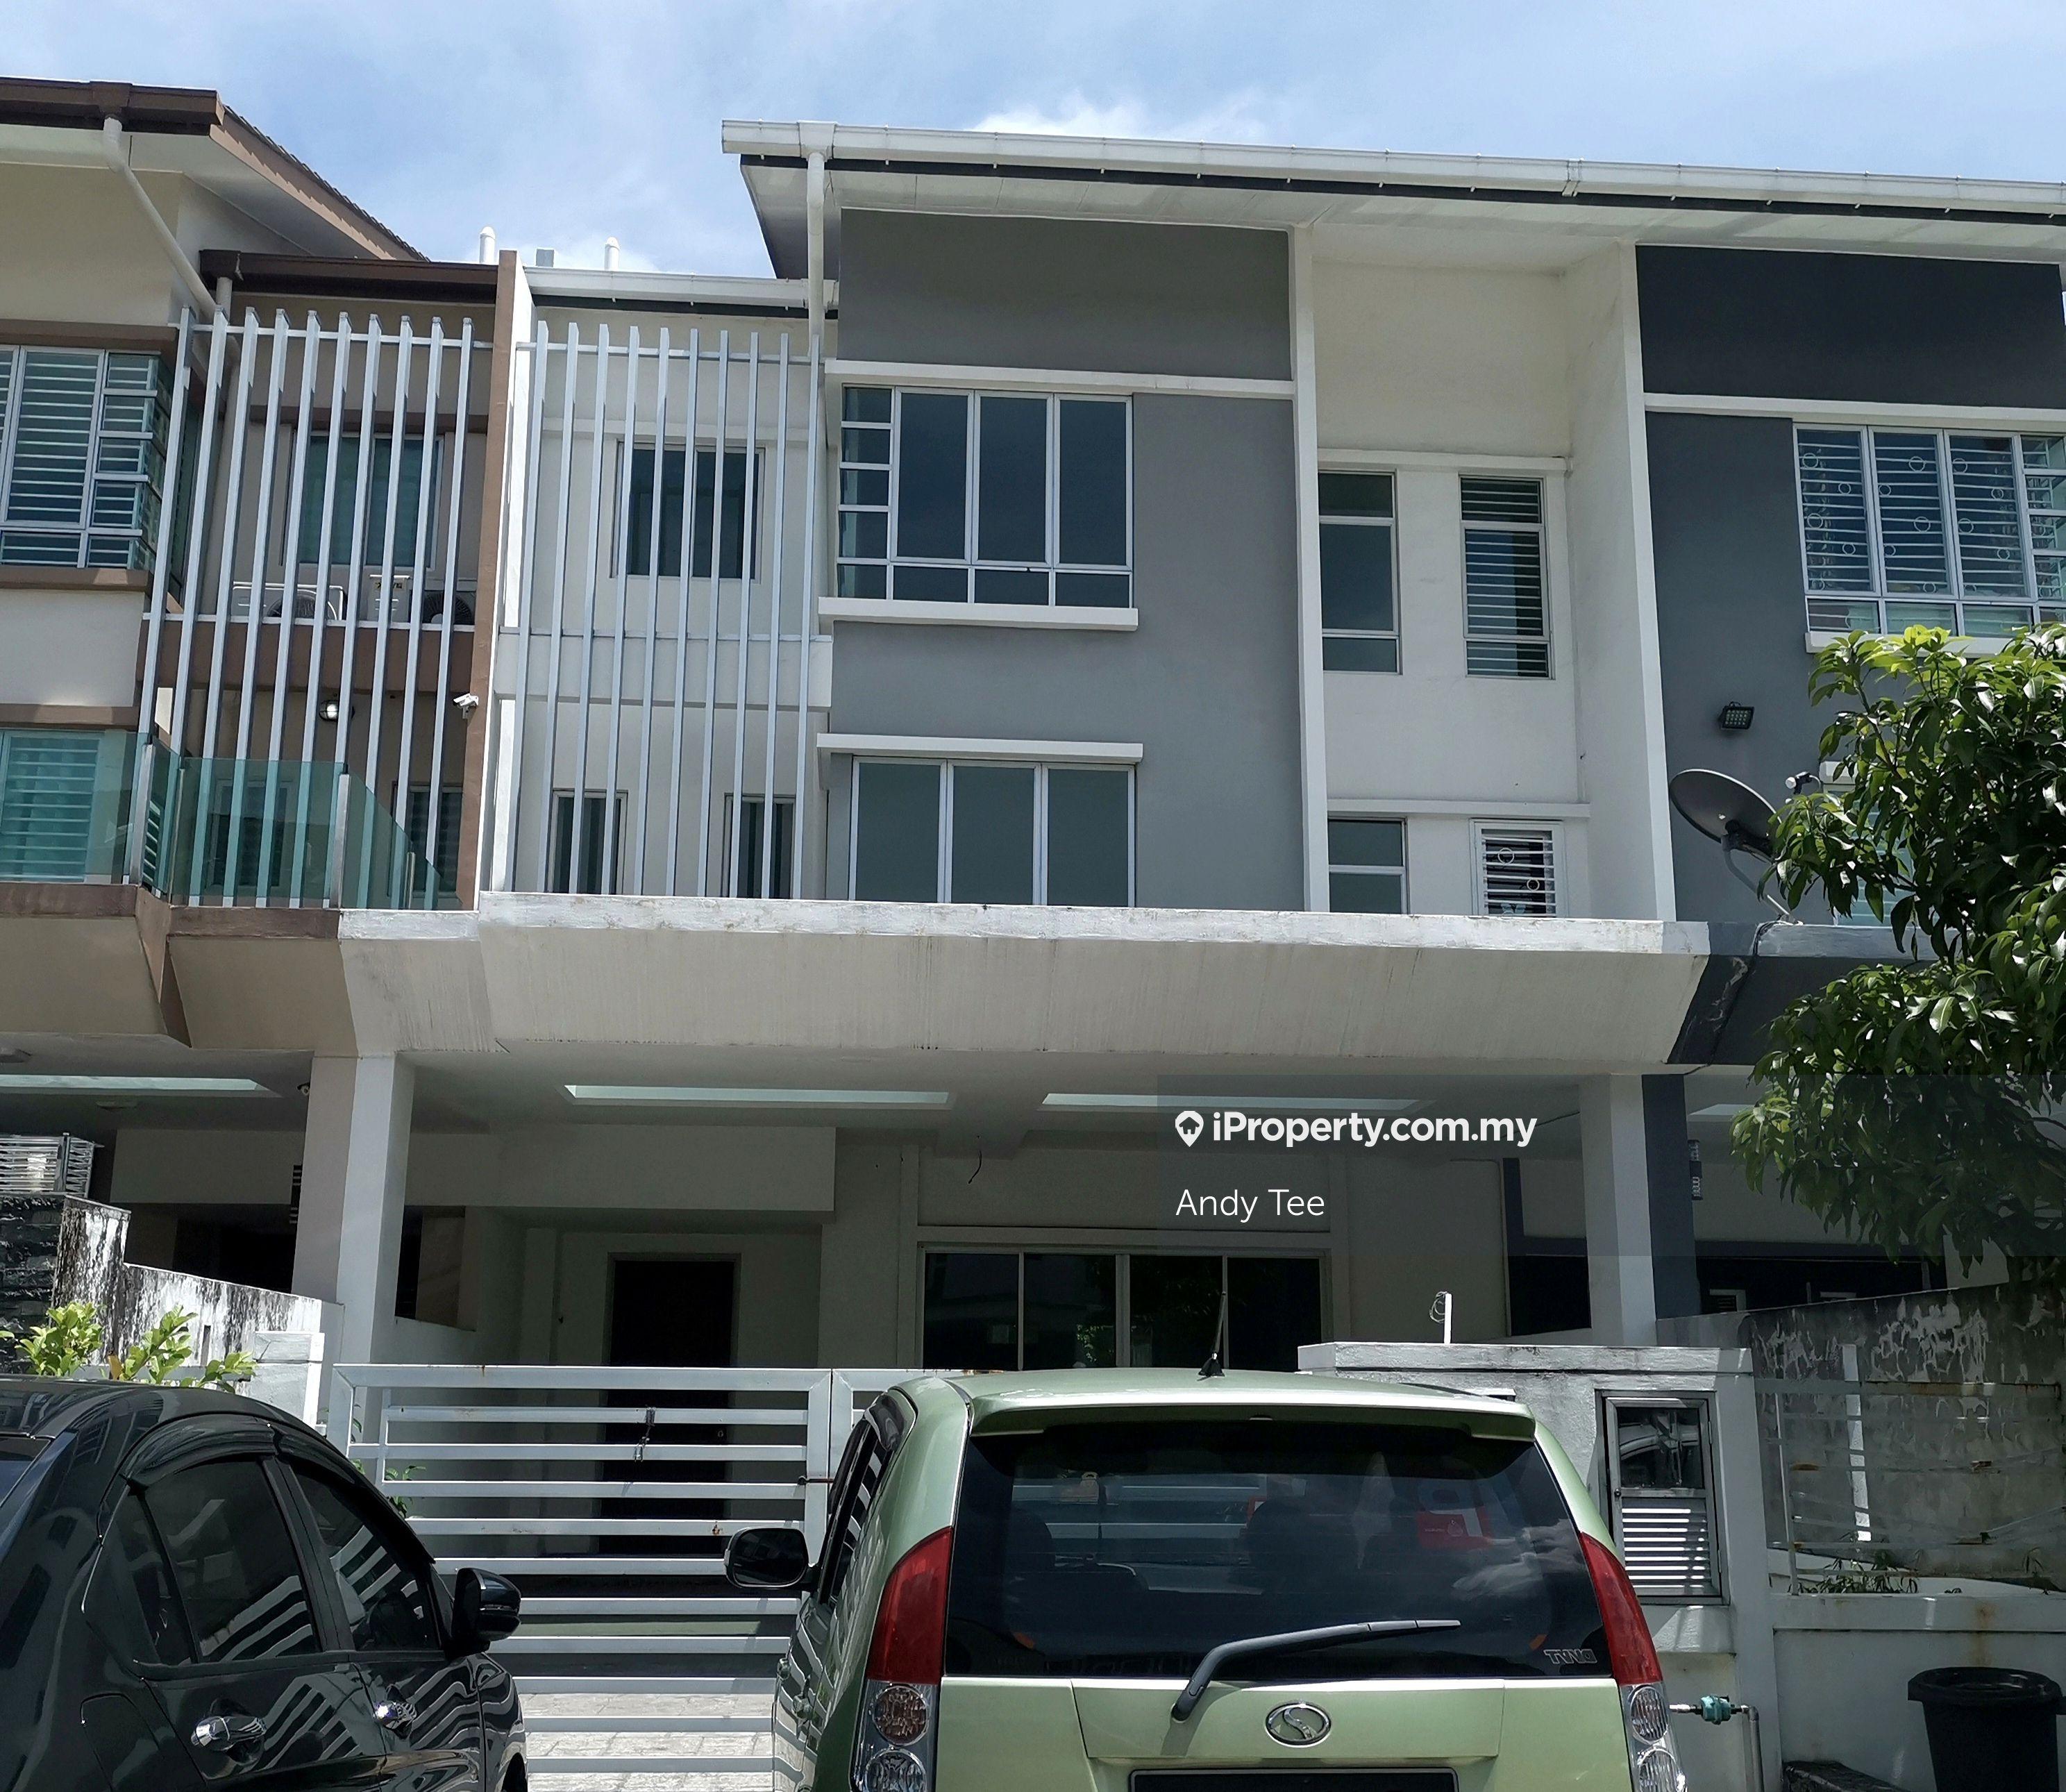 Bukit Tinggi, Bandar Botanic, Ambang Botanic Klang, Bandar Bukit Tinggi